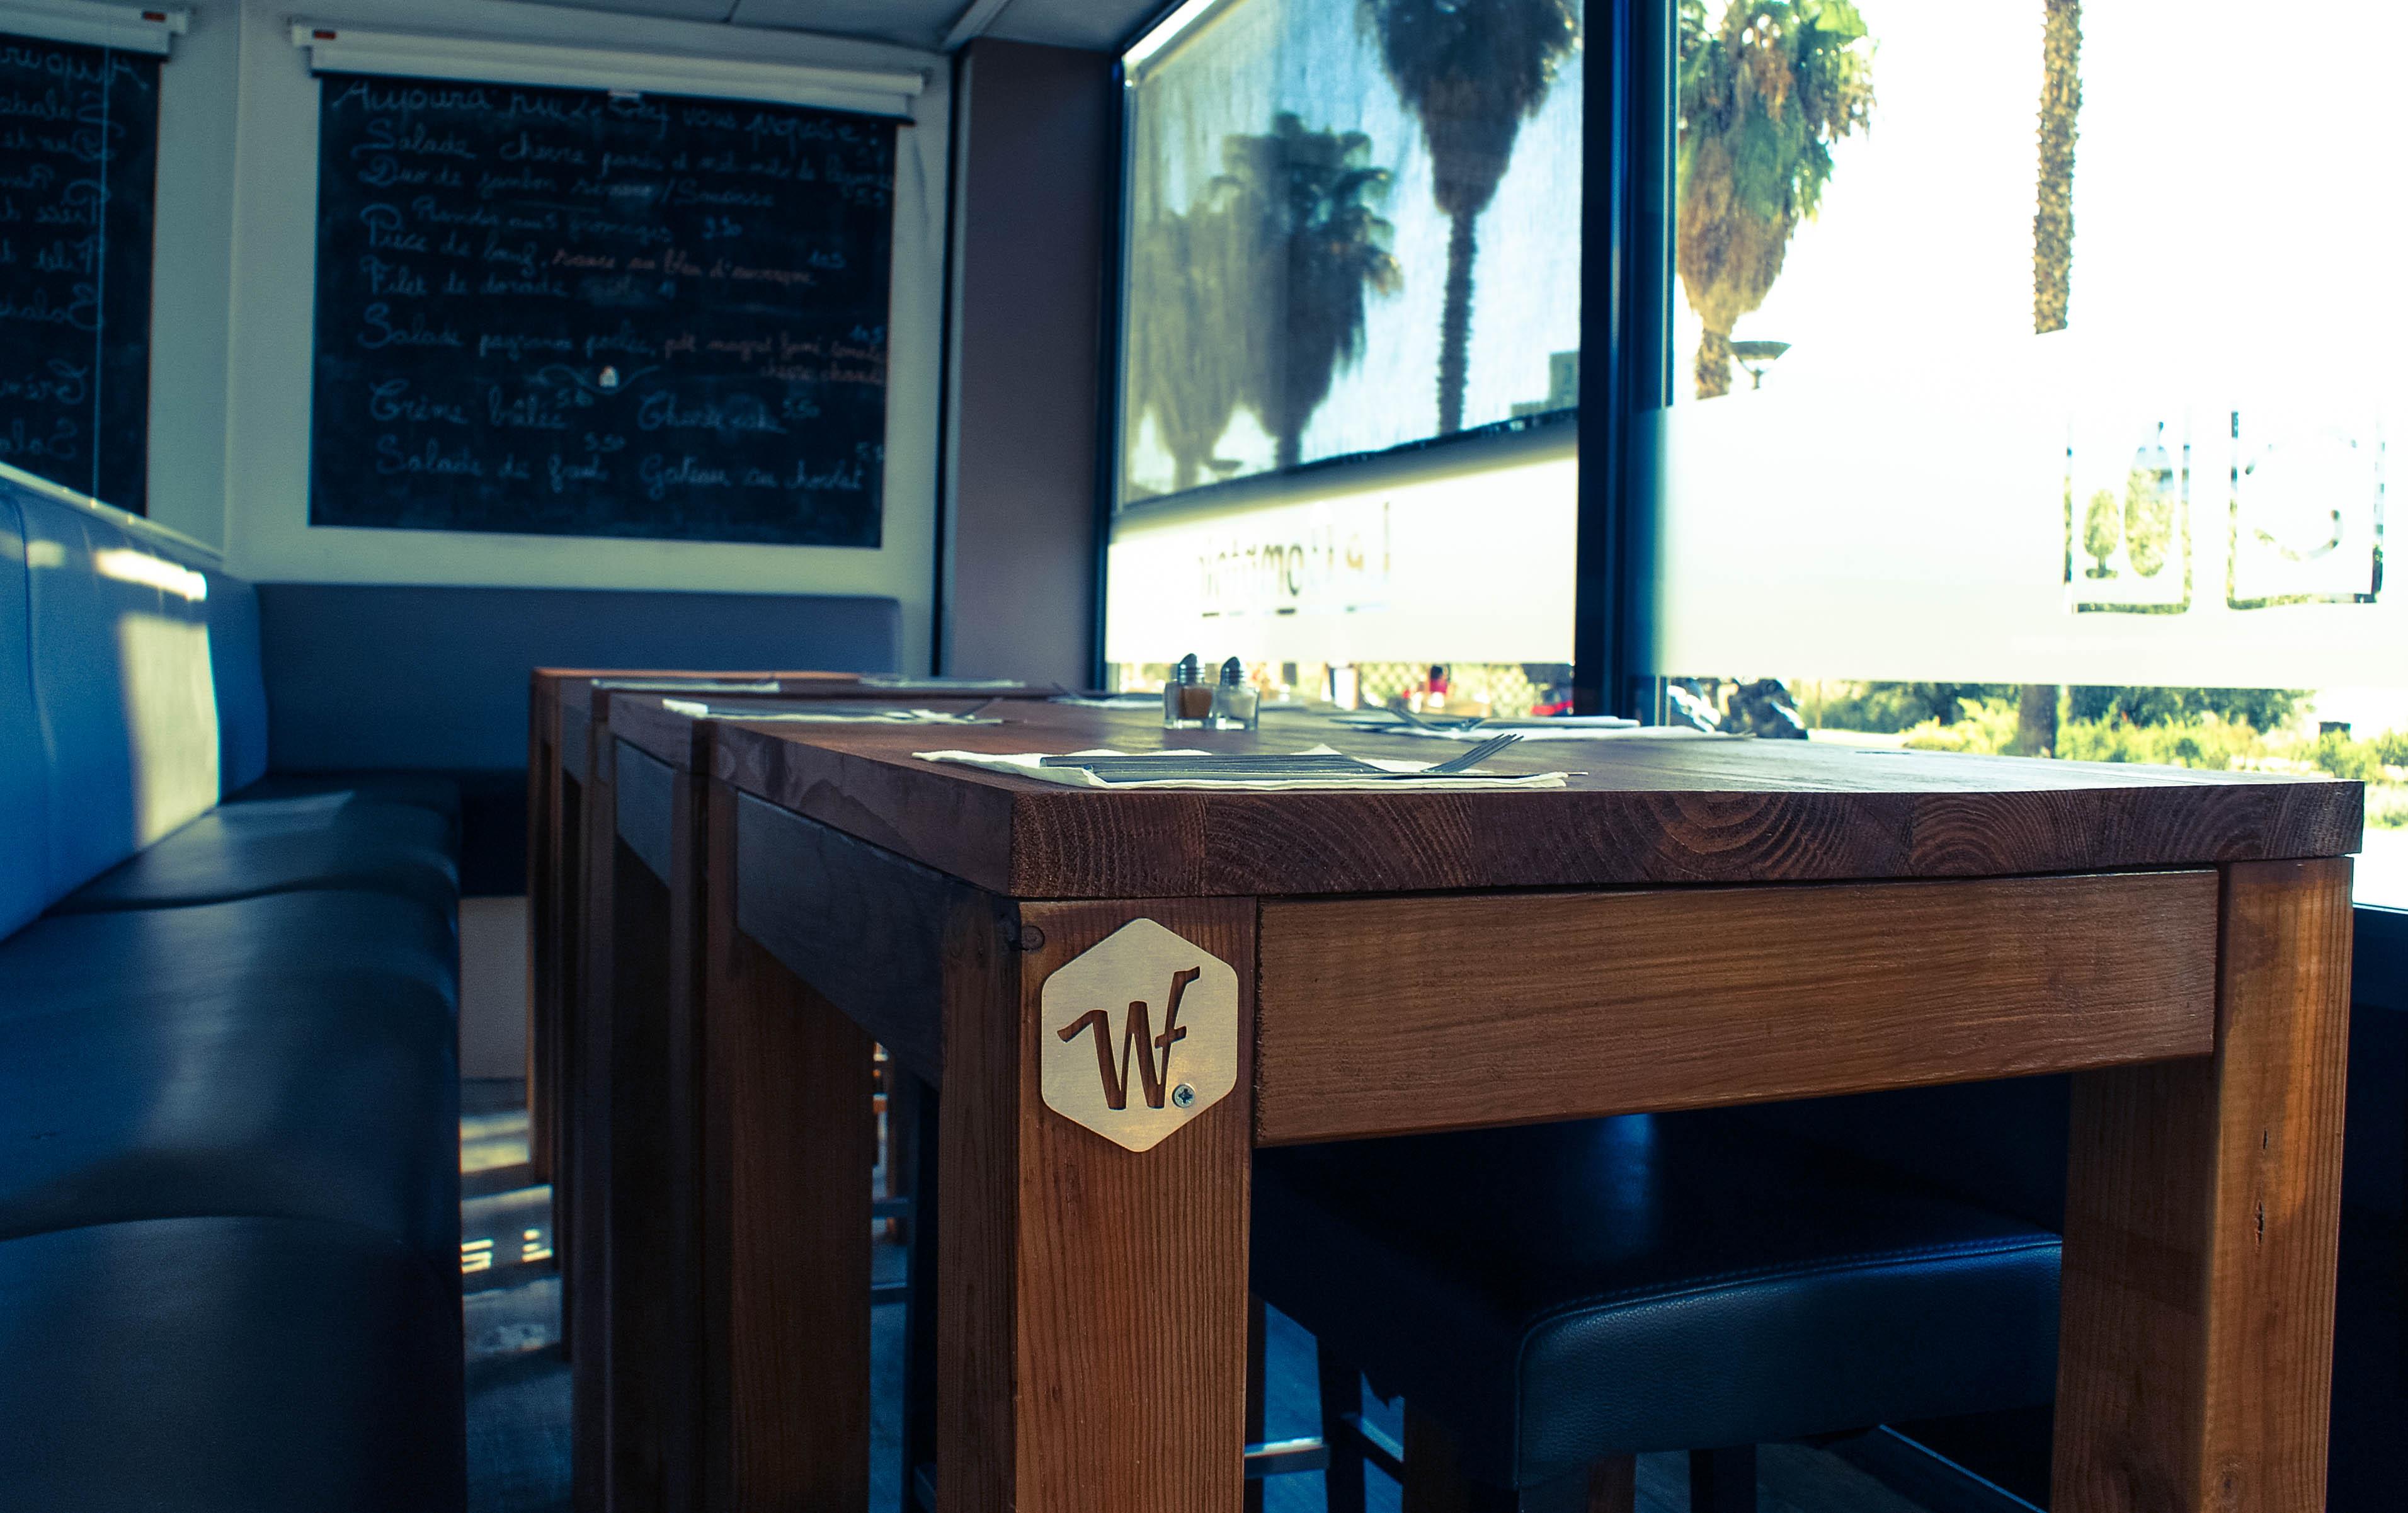 Tables int Le comptoir 2